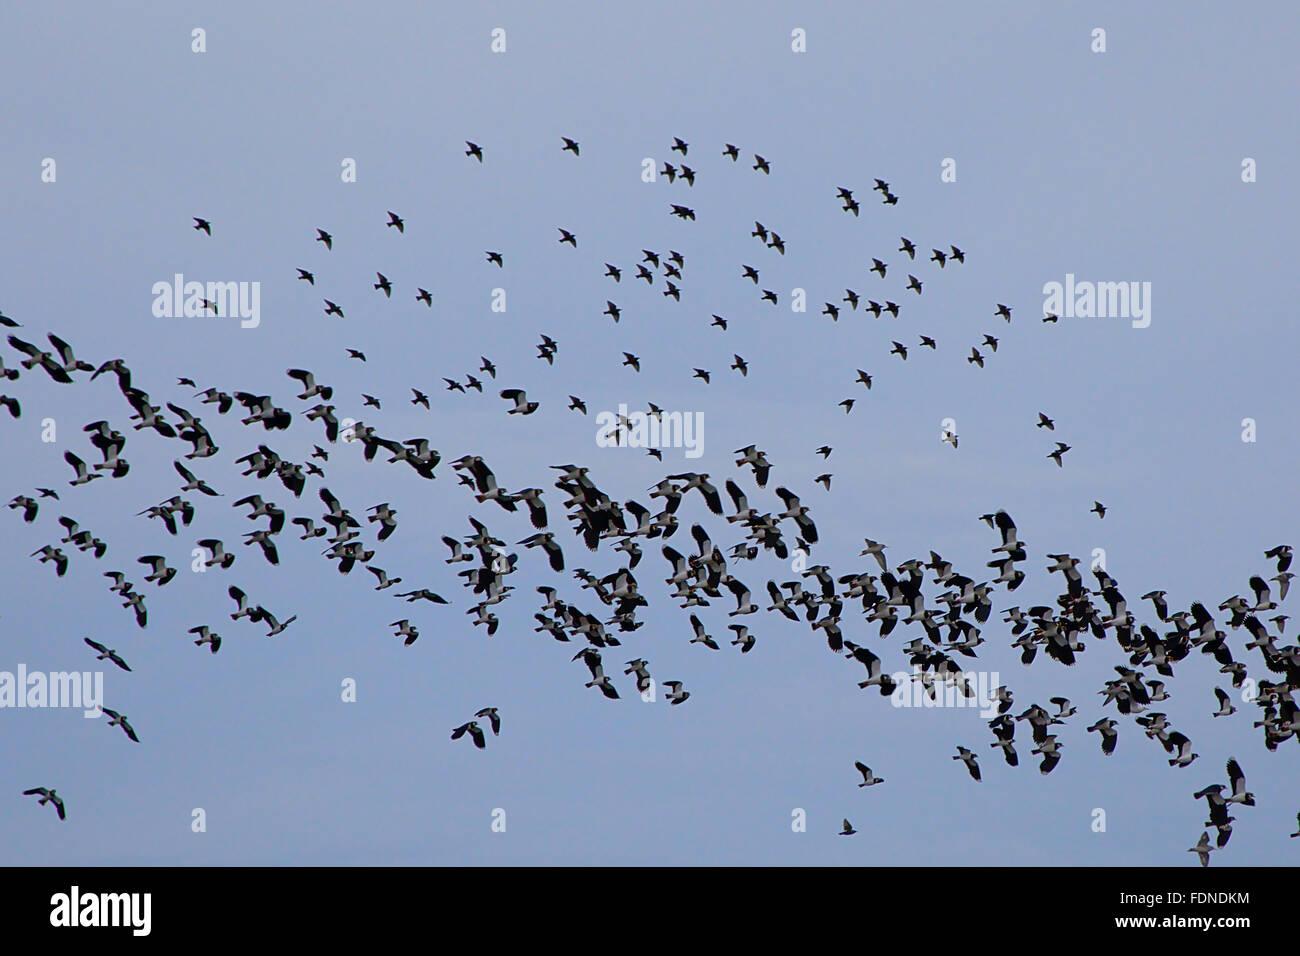 two flocks of birds - Stock Image